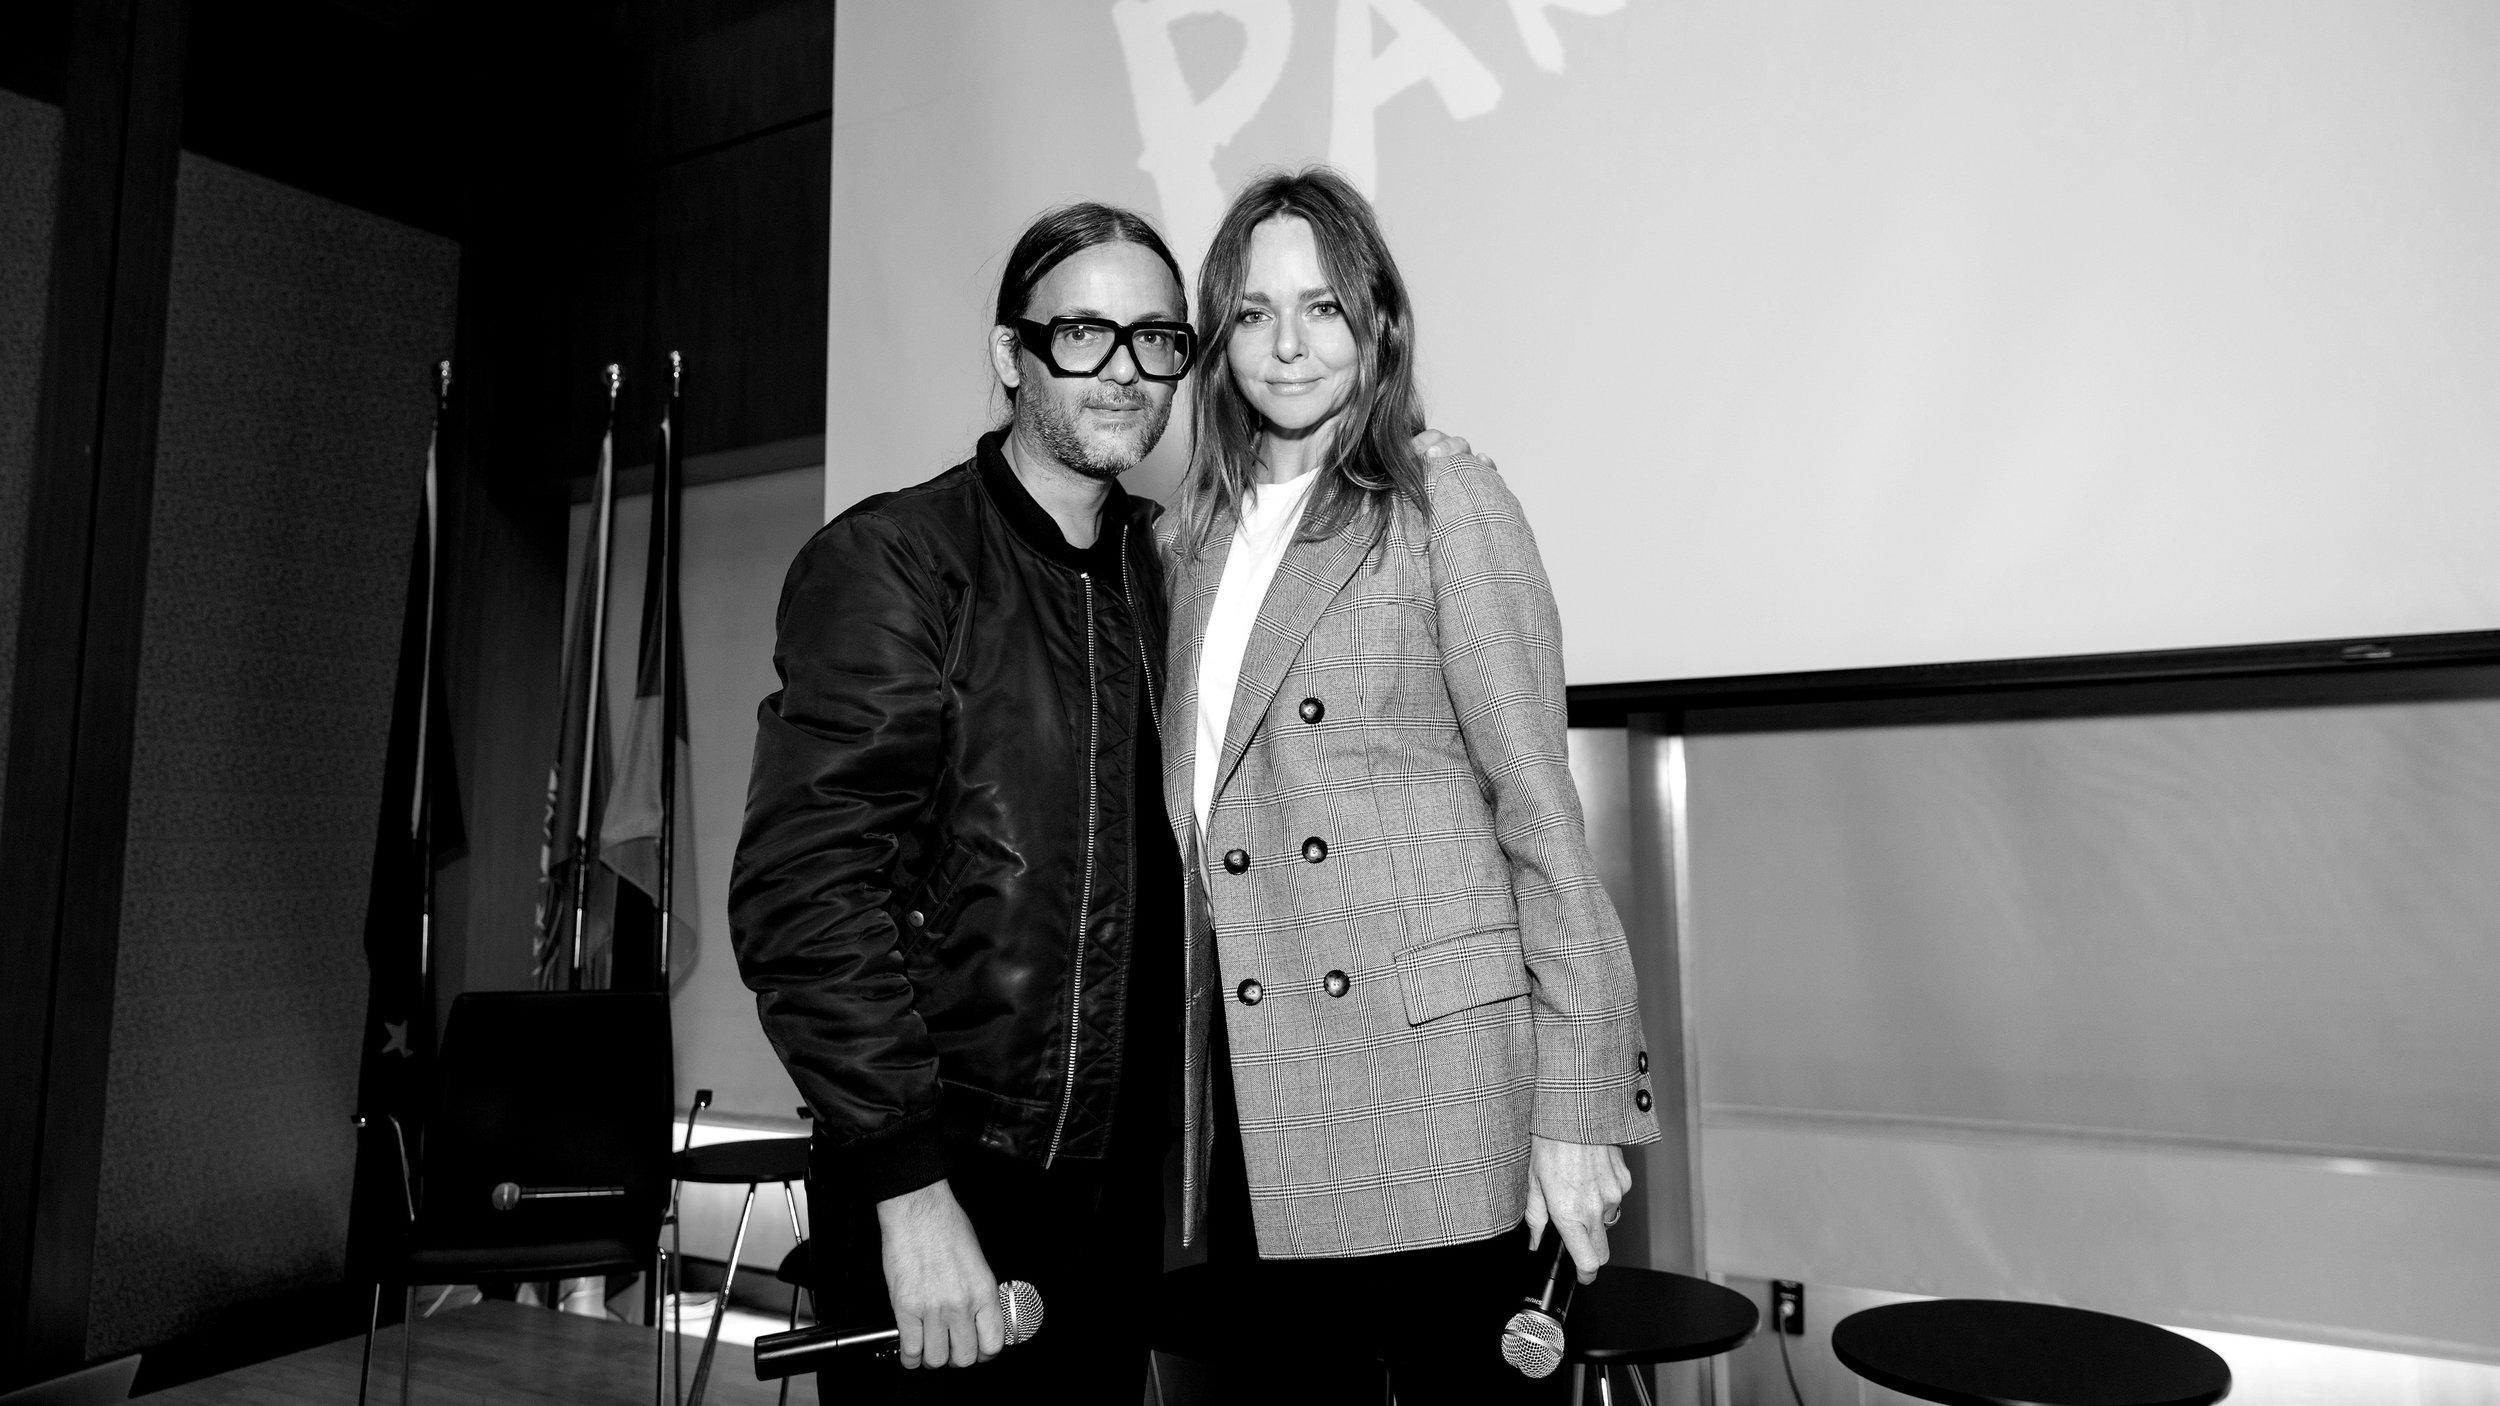 Parley founder Cyrill Gutsch and Stella McCartney